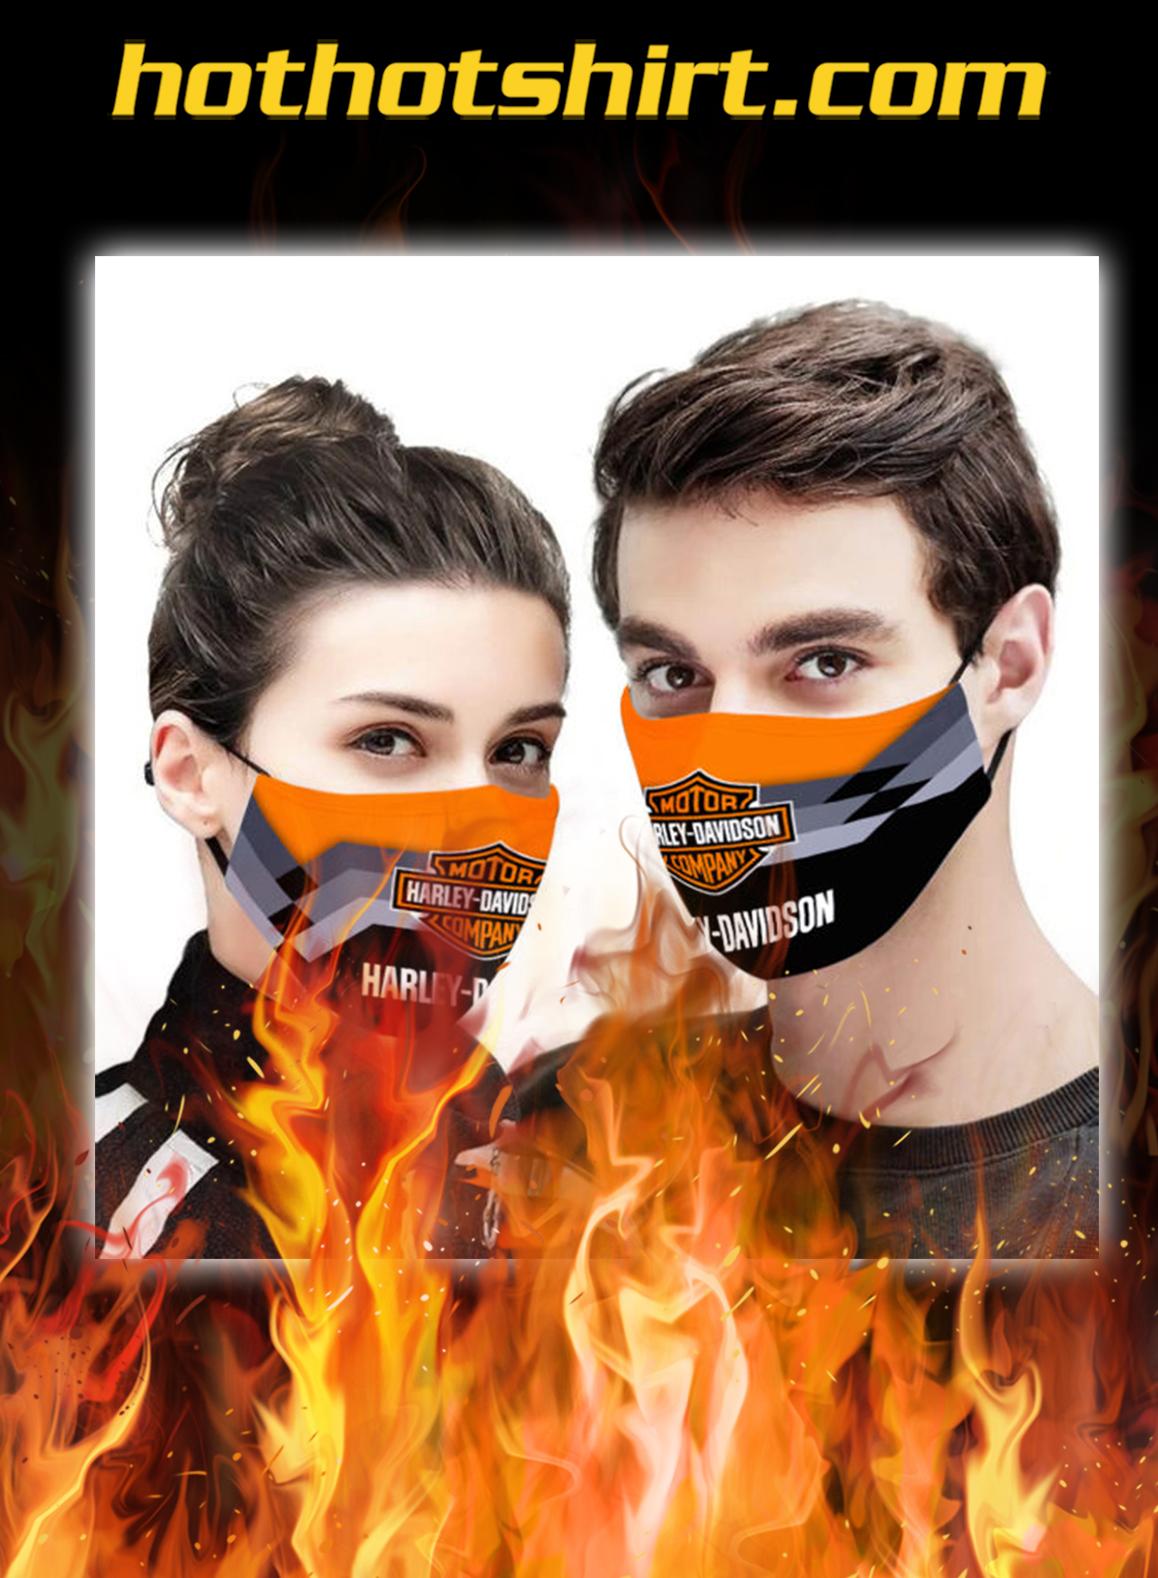 Harley davidson face mask - pic 1